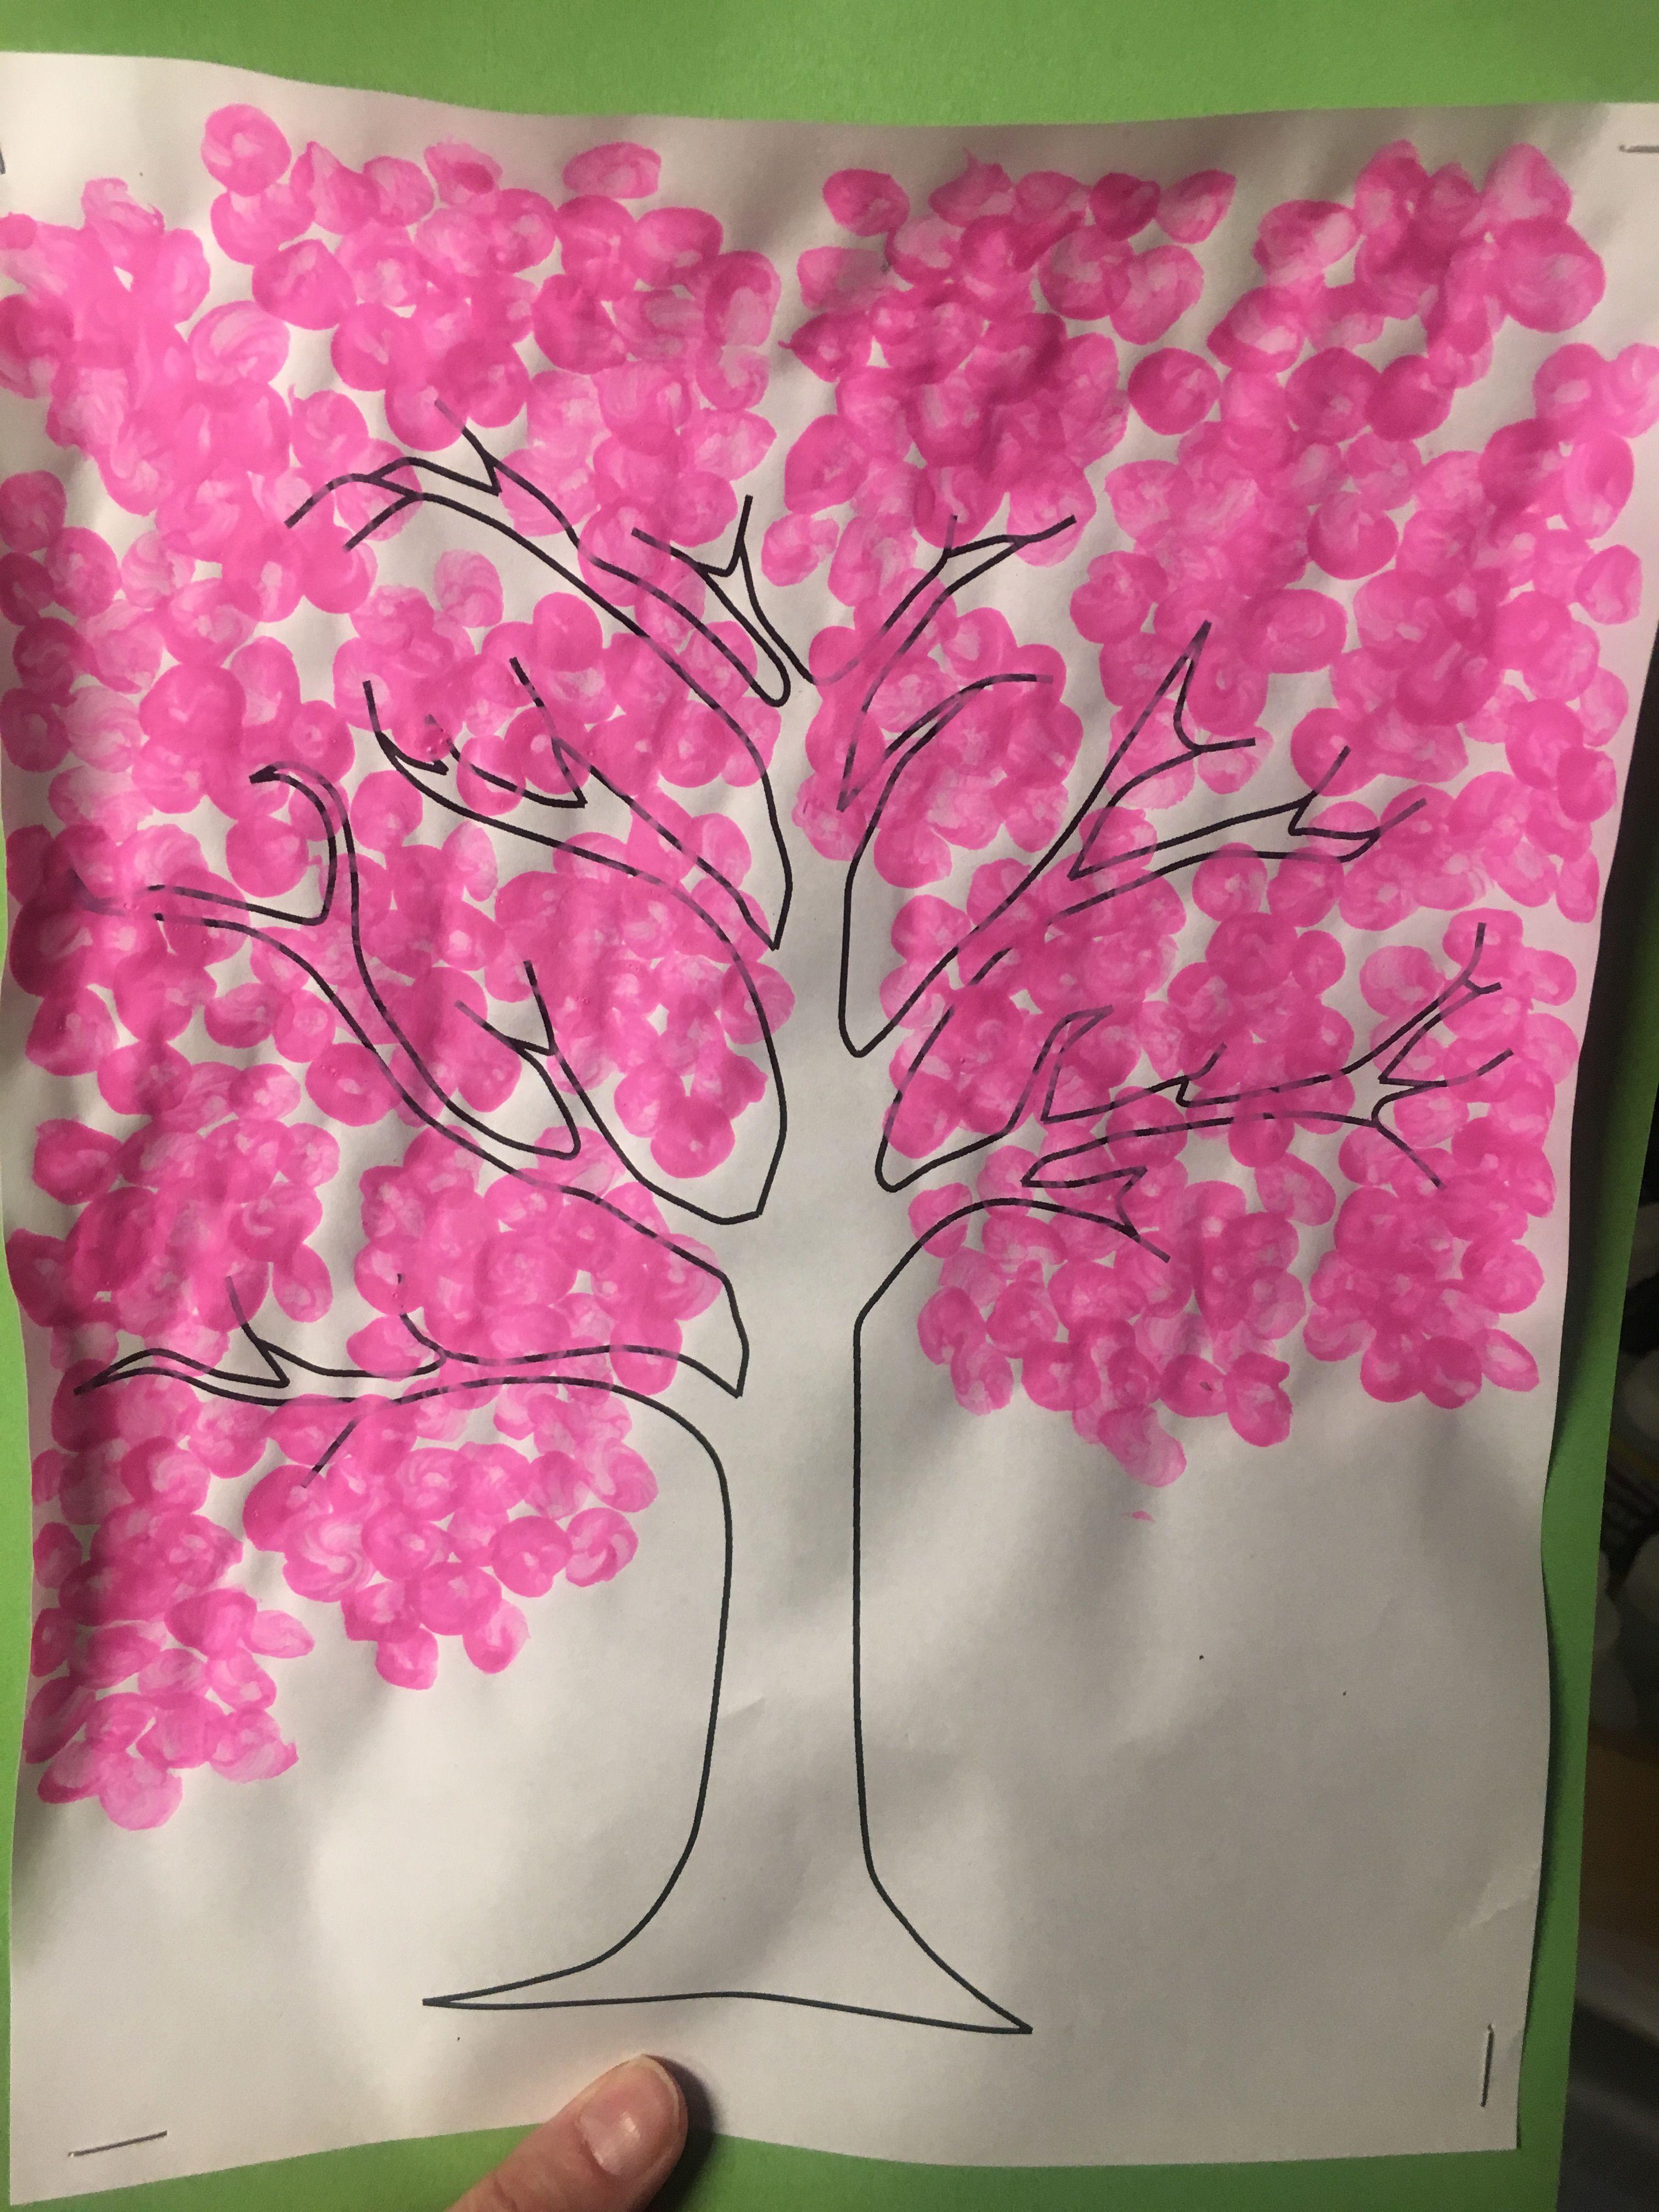 Cherry Blossom Tree Q Tip Painting Cherry Blossom Tree Blossom Trees Q Tip Painting